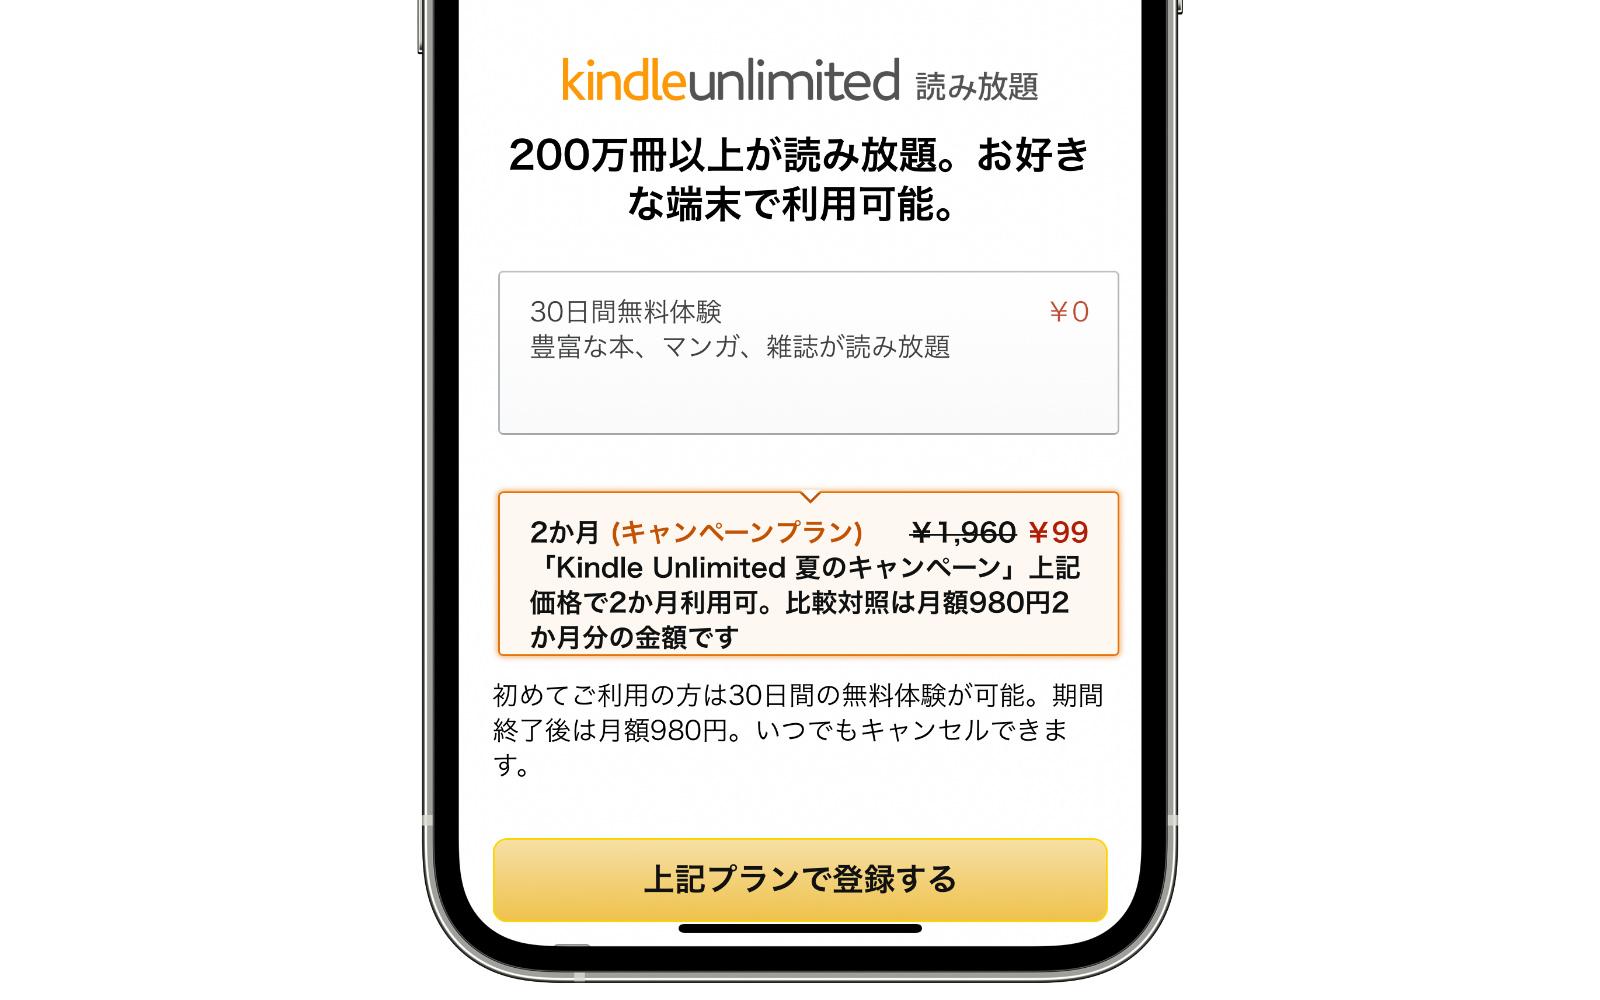 Kindle Unlimited Campaign Link SP